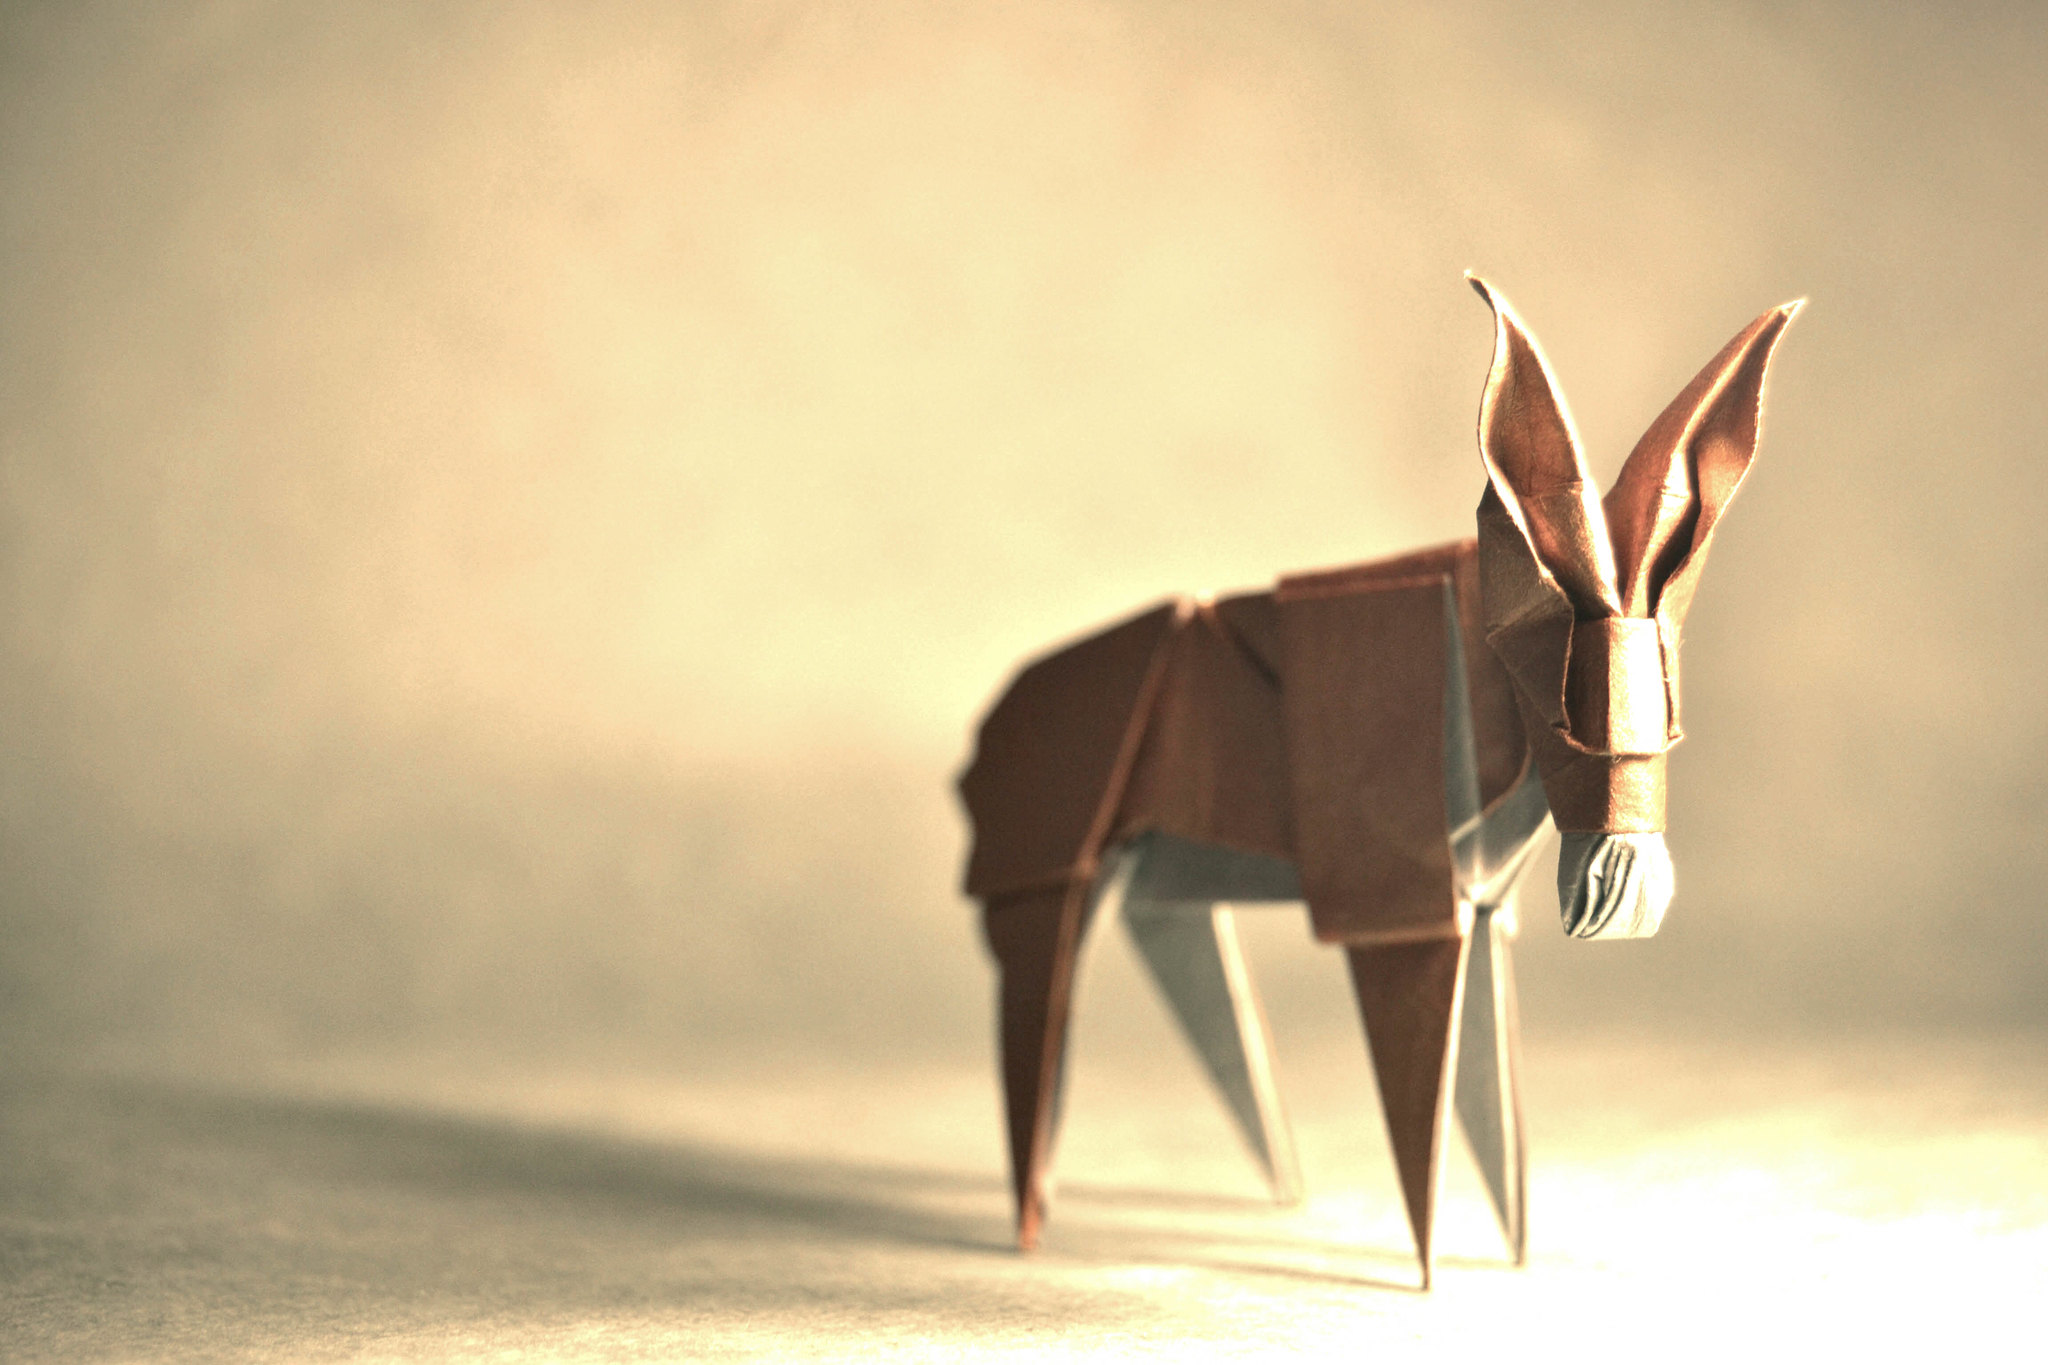 Origami Donkey - Román Díaz